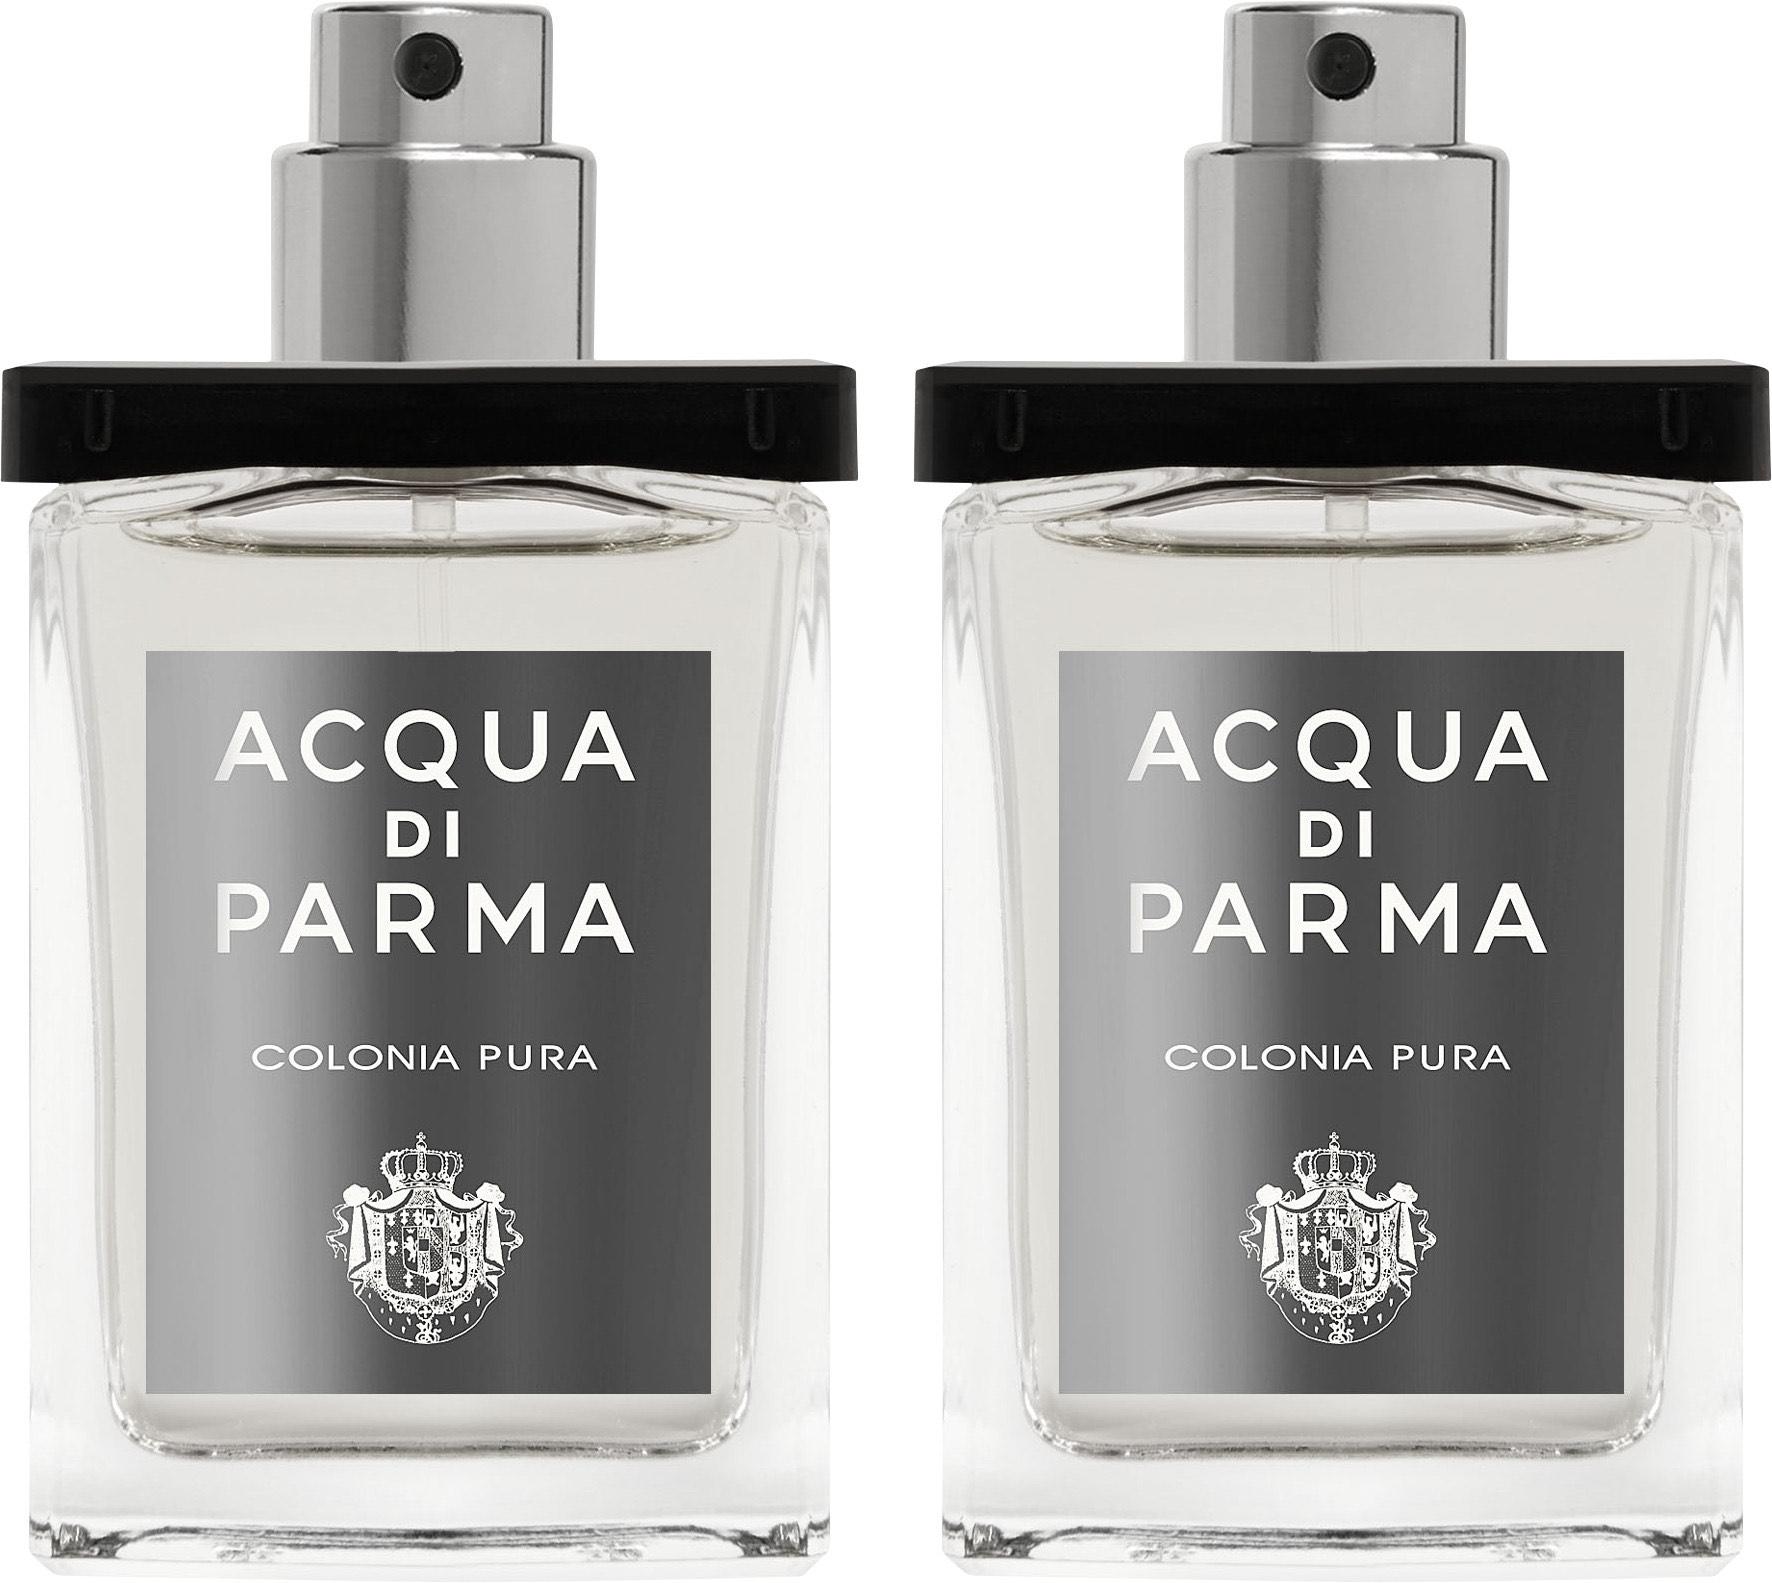 Acqua di Parma Colonia Pura Eau de Cologne Gift Set 2 x 30ml Refill £38.50 @ Perfume Click